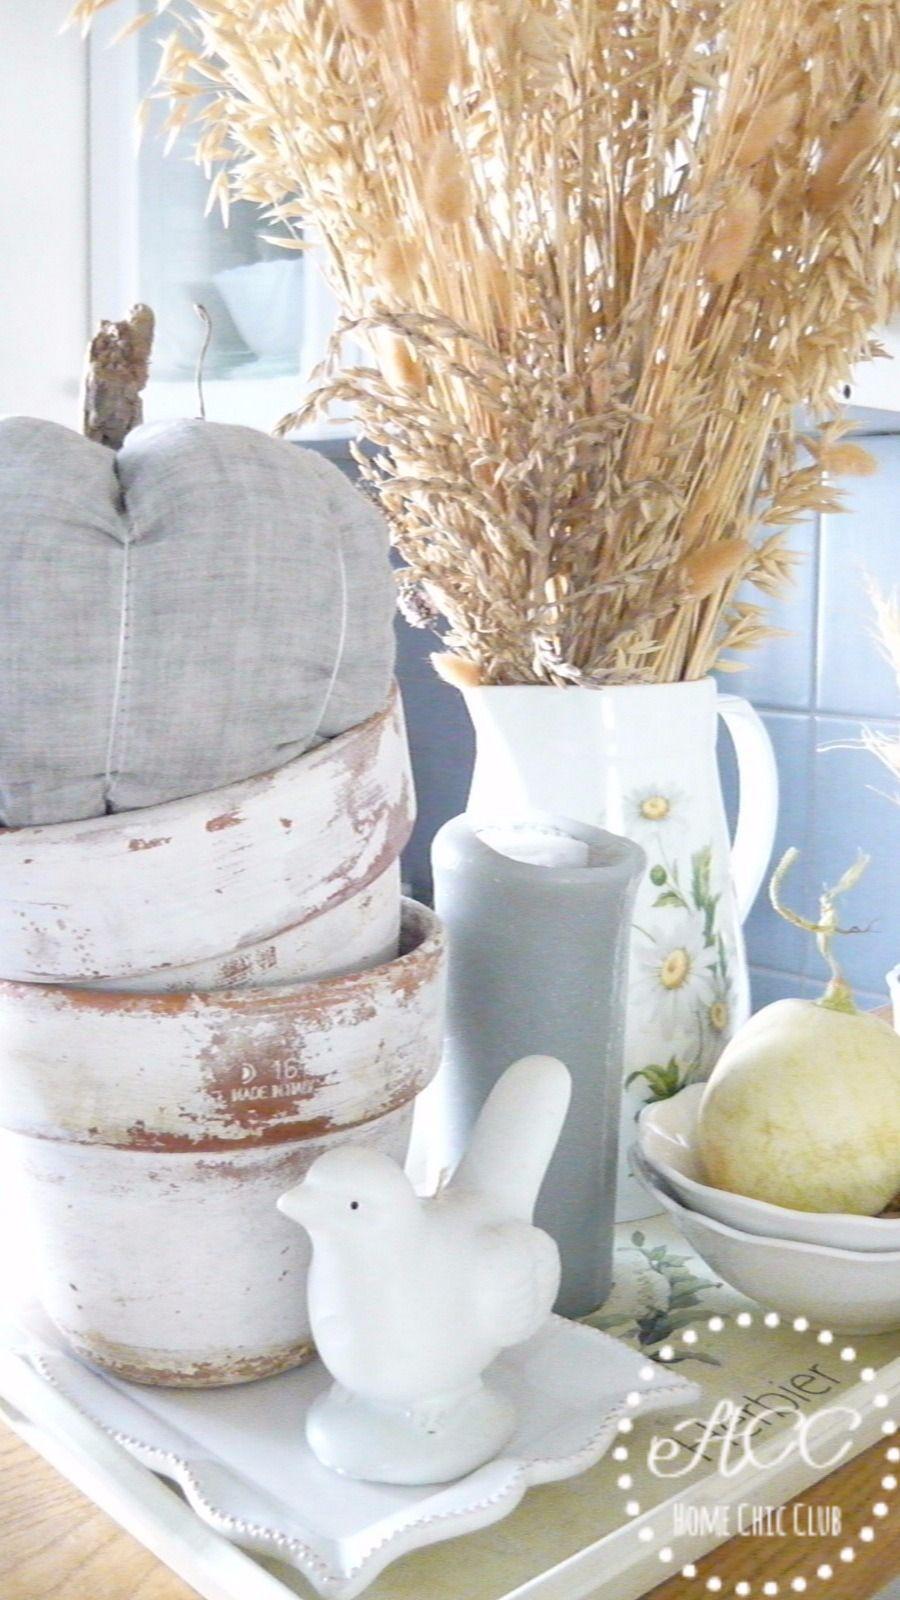 A blog about home decor and lifestyle. Creative DIY home decor ideas ...